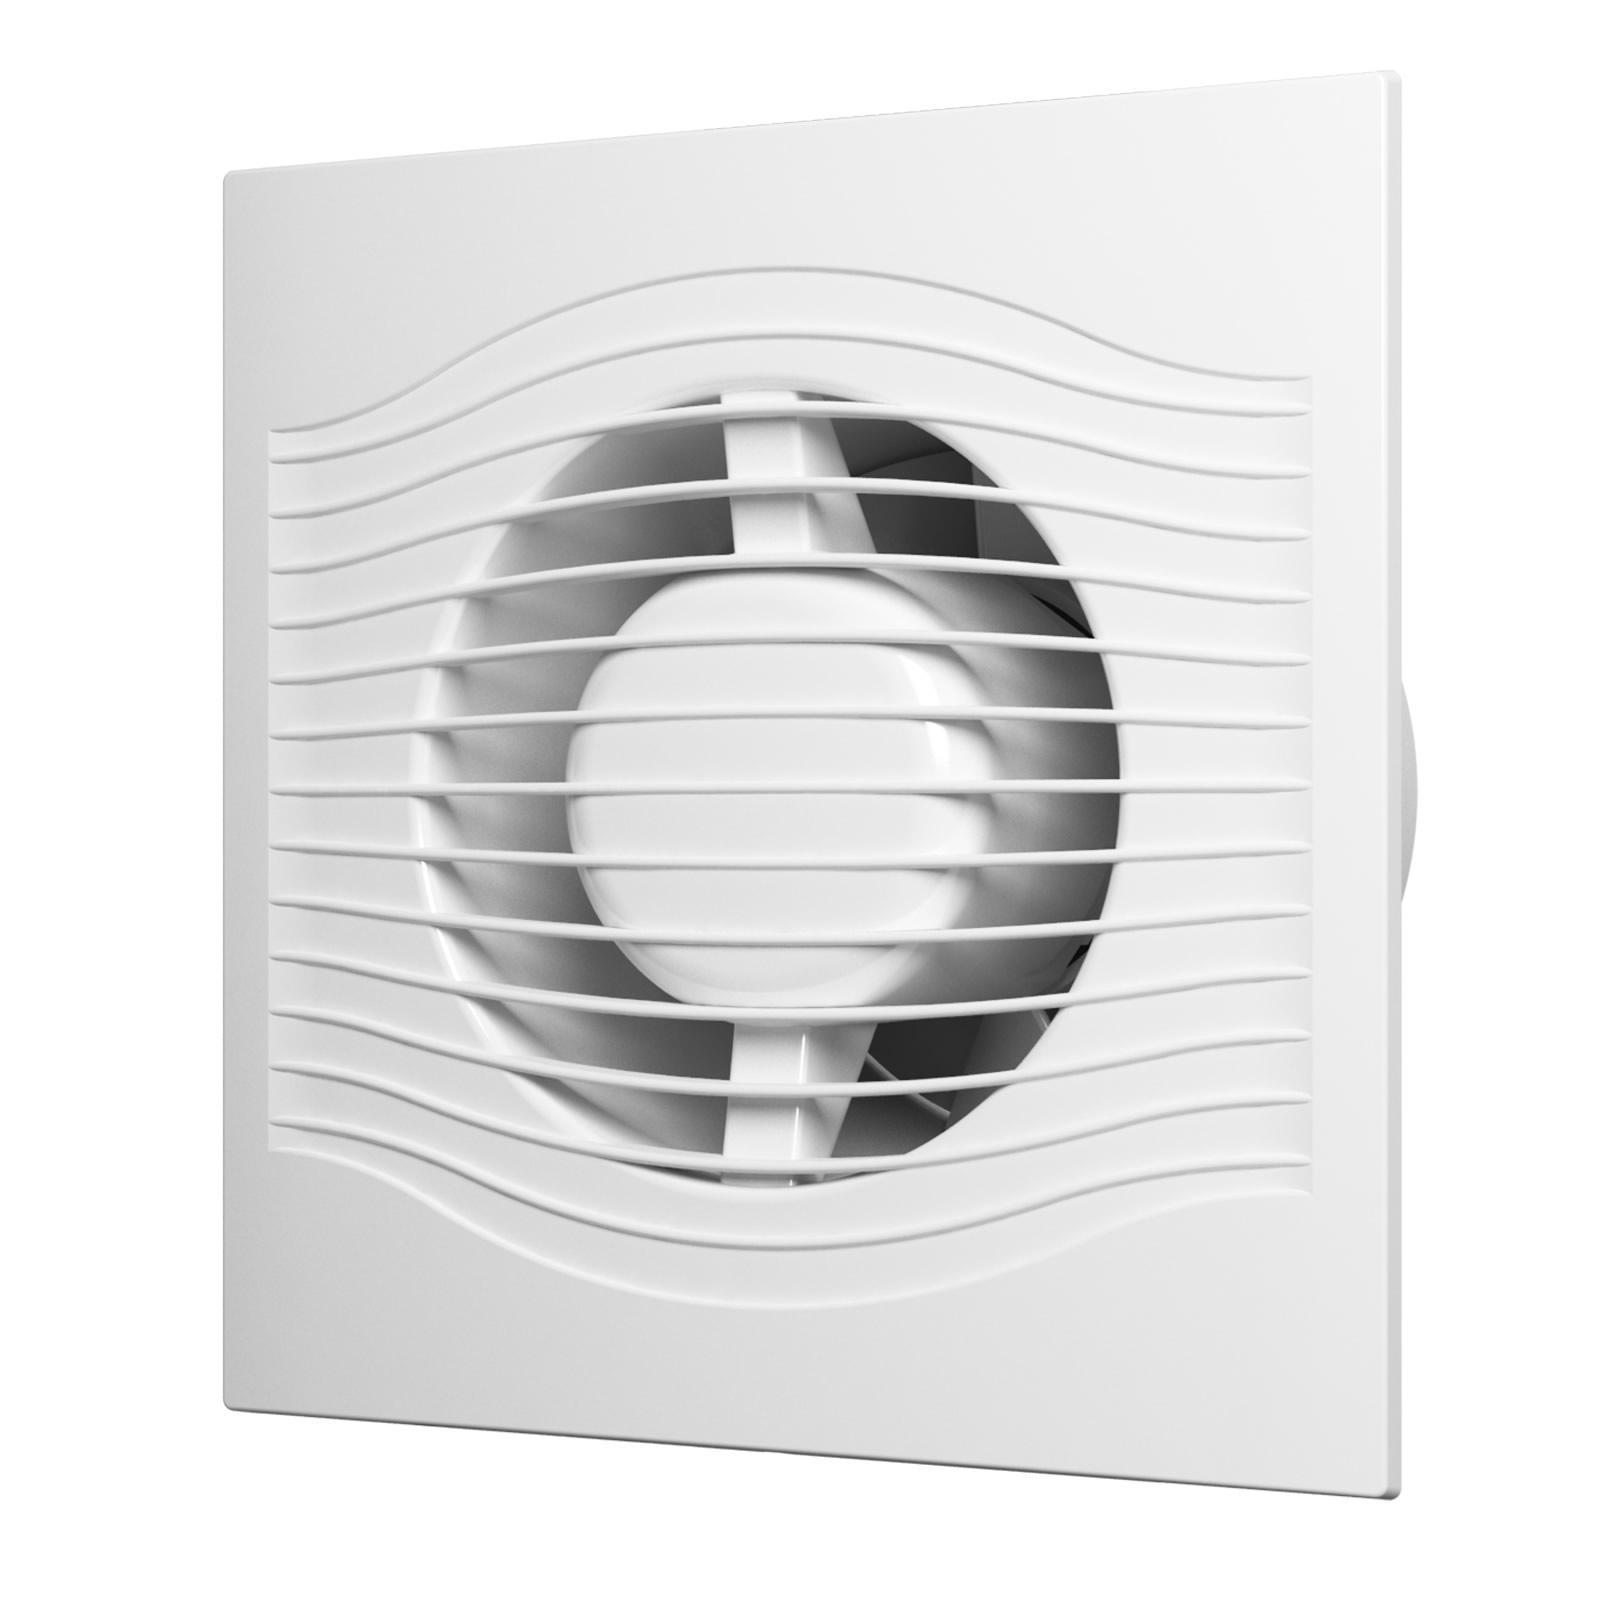 Вентилятор Diciti Slim 4c mrh-02